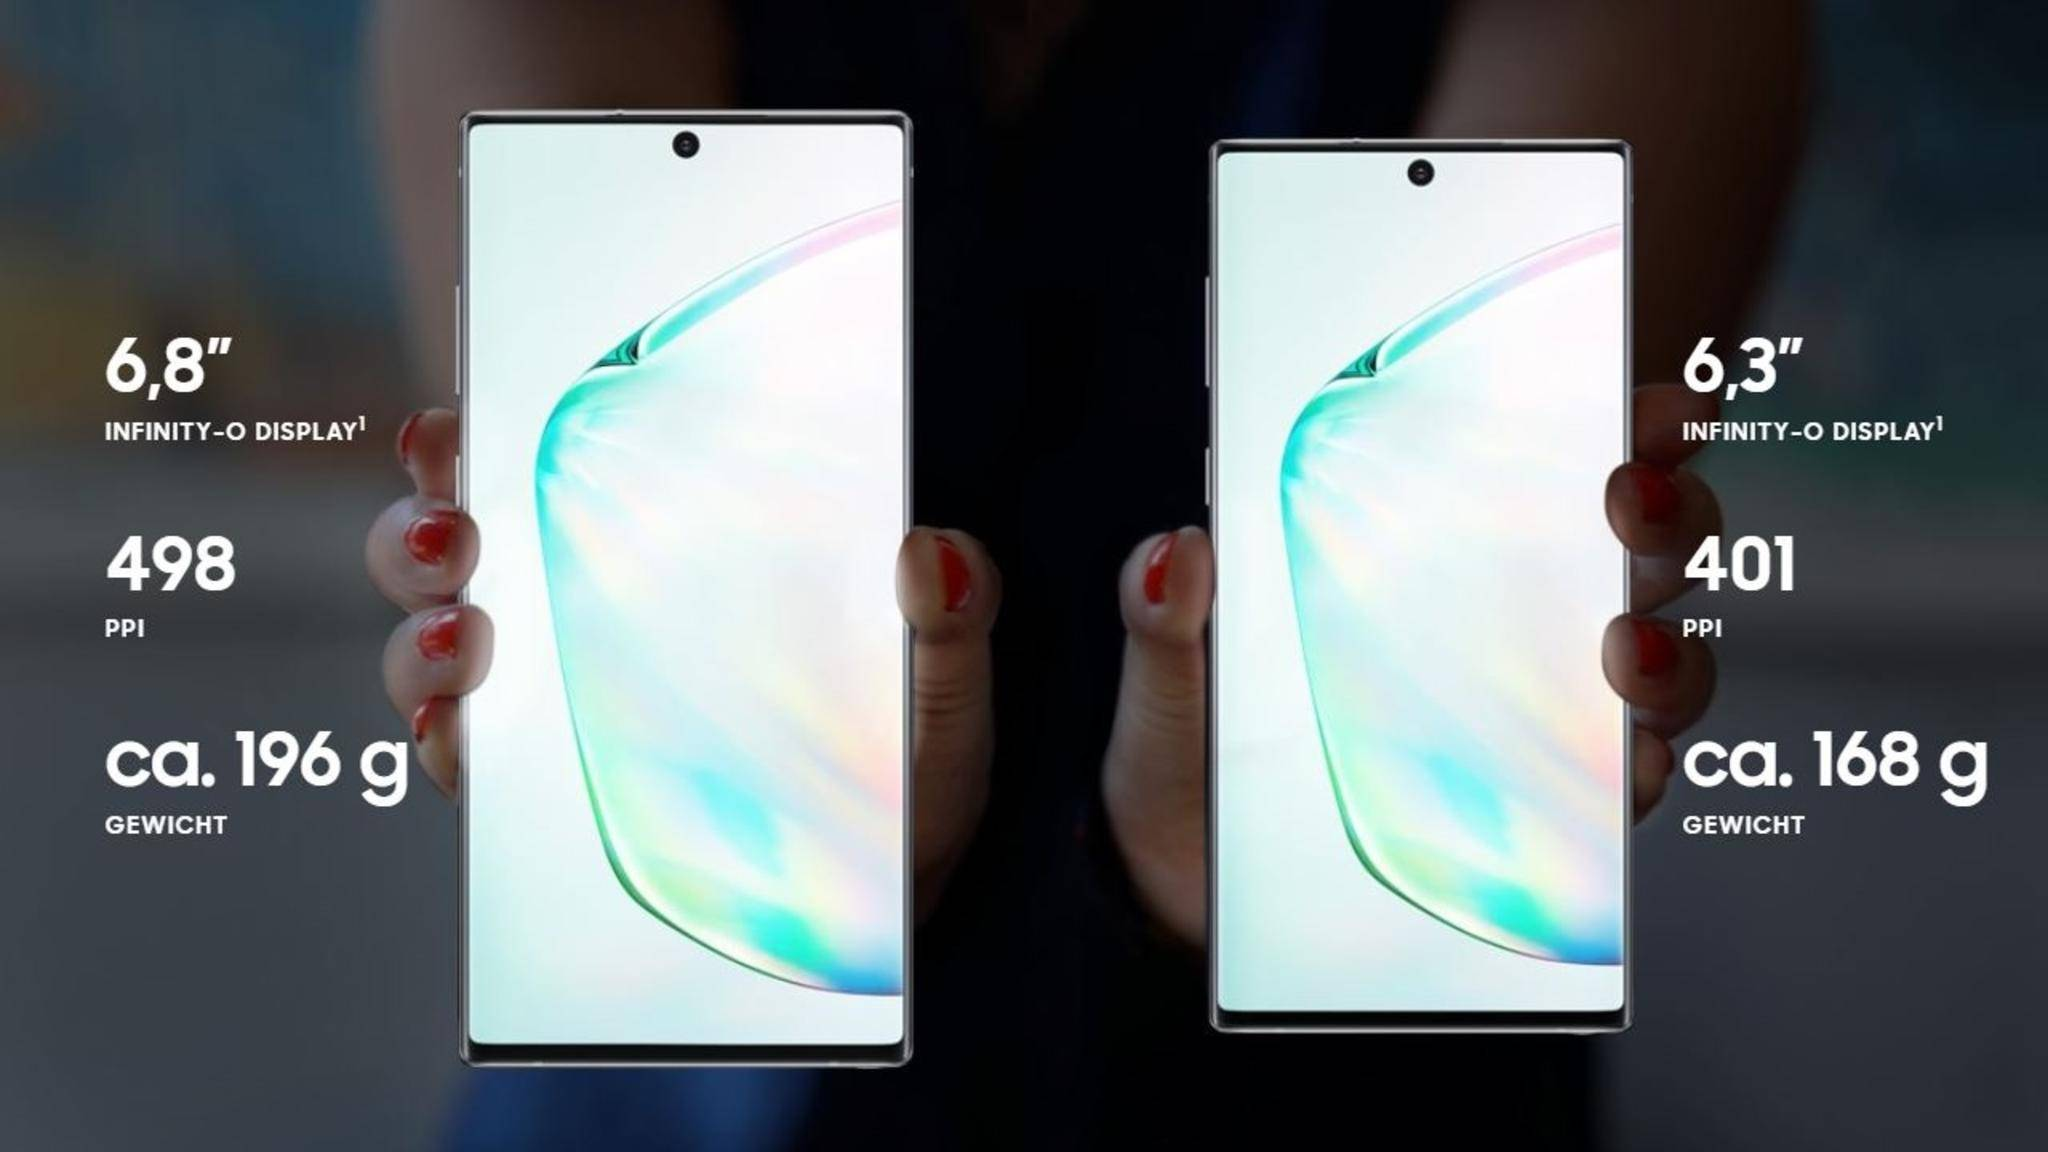 Samsung Galaxy Note 10 Plus Display